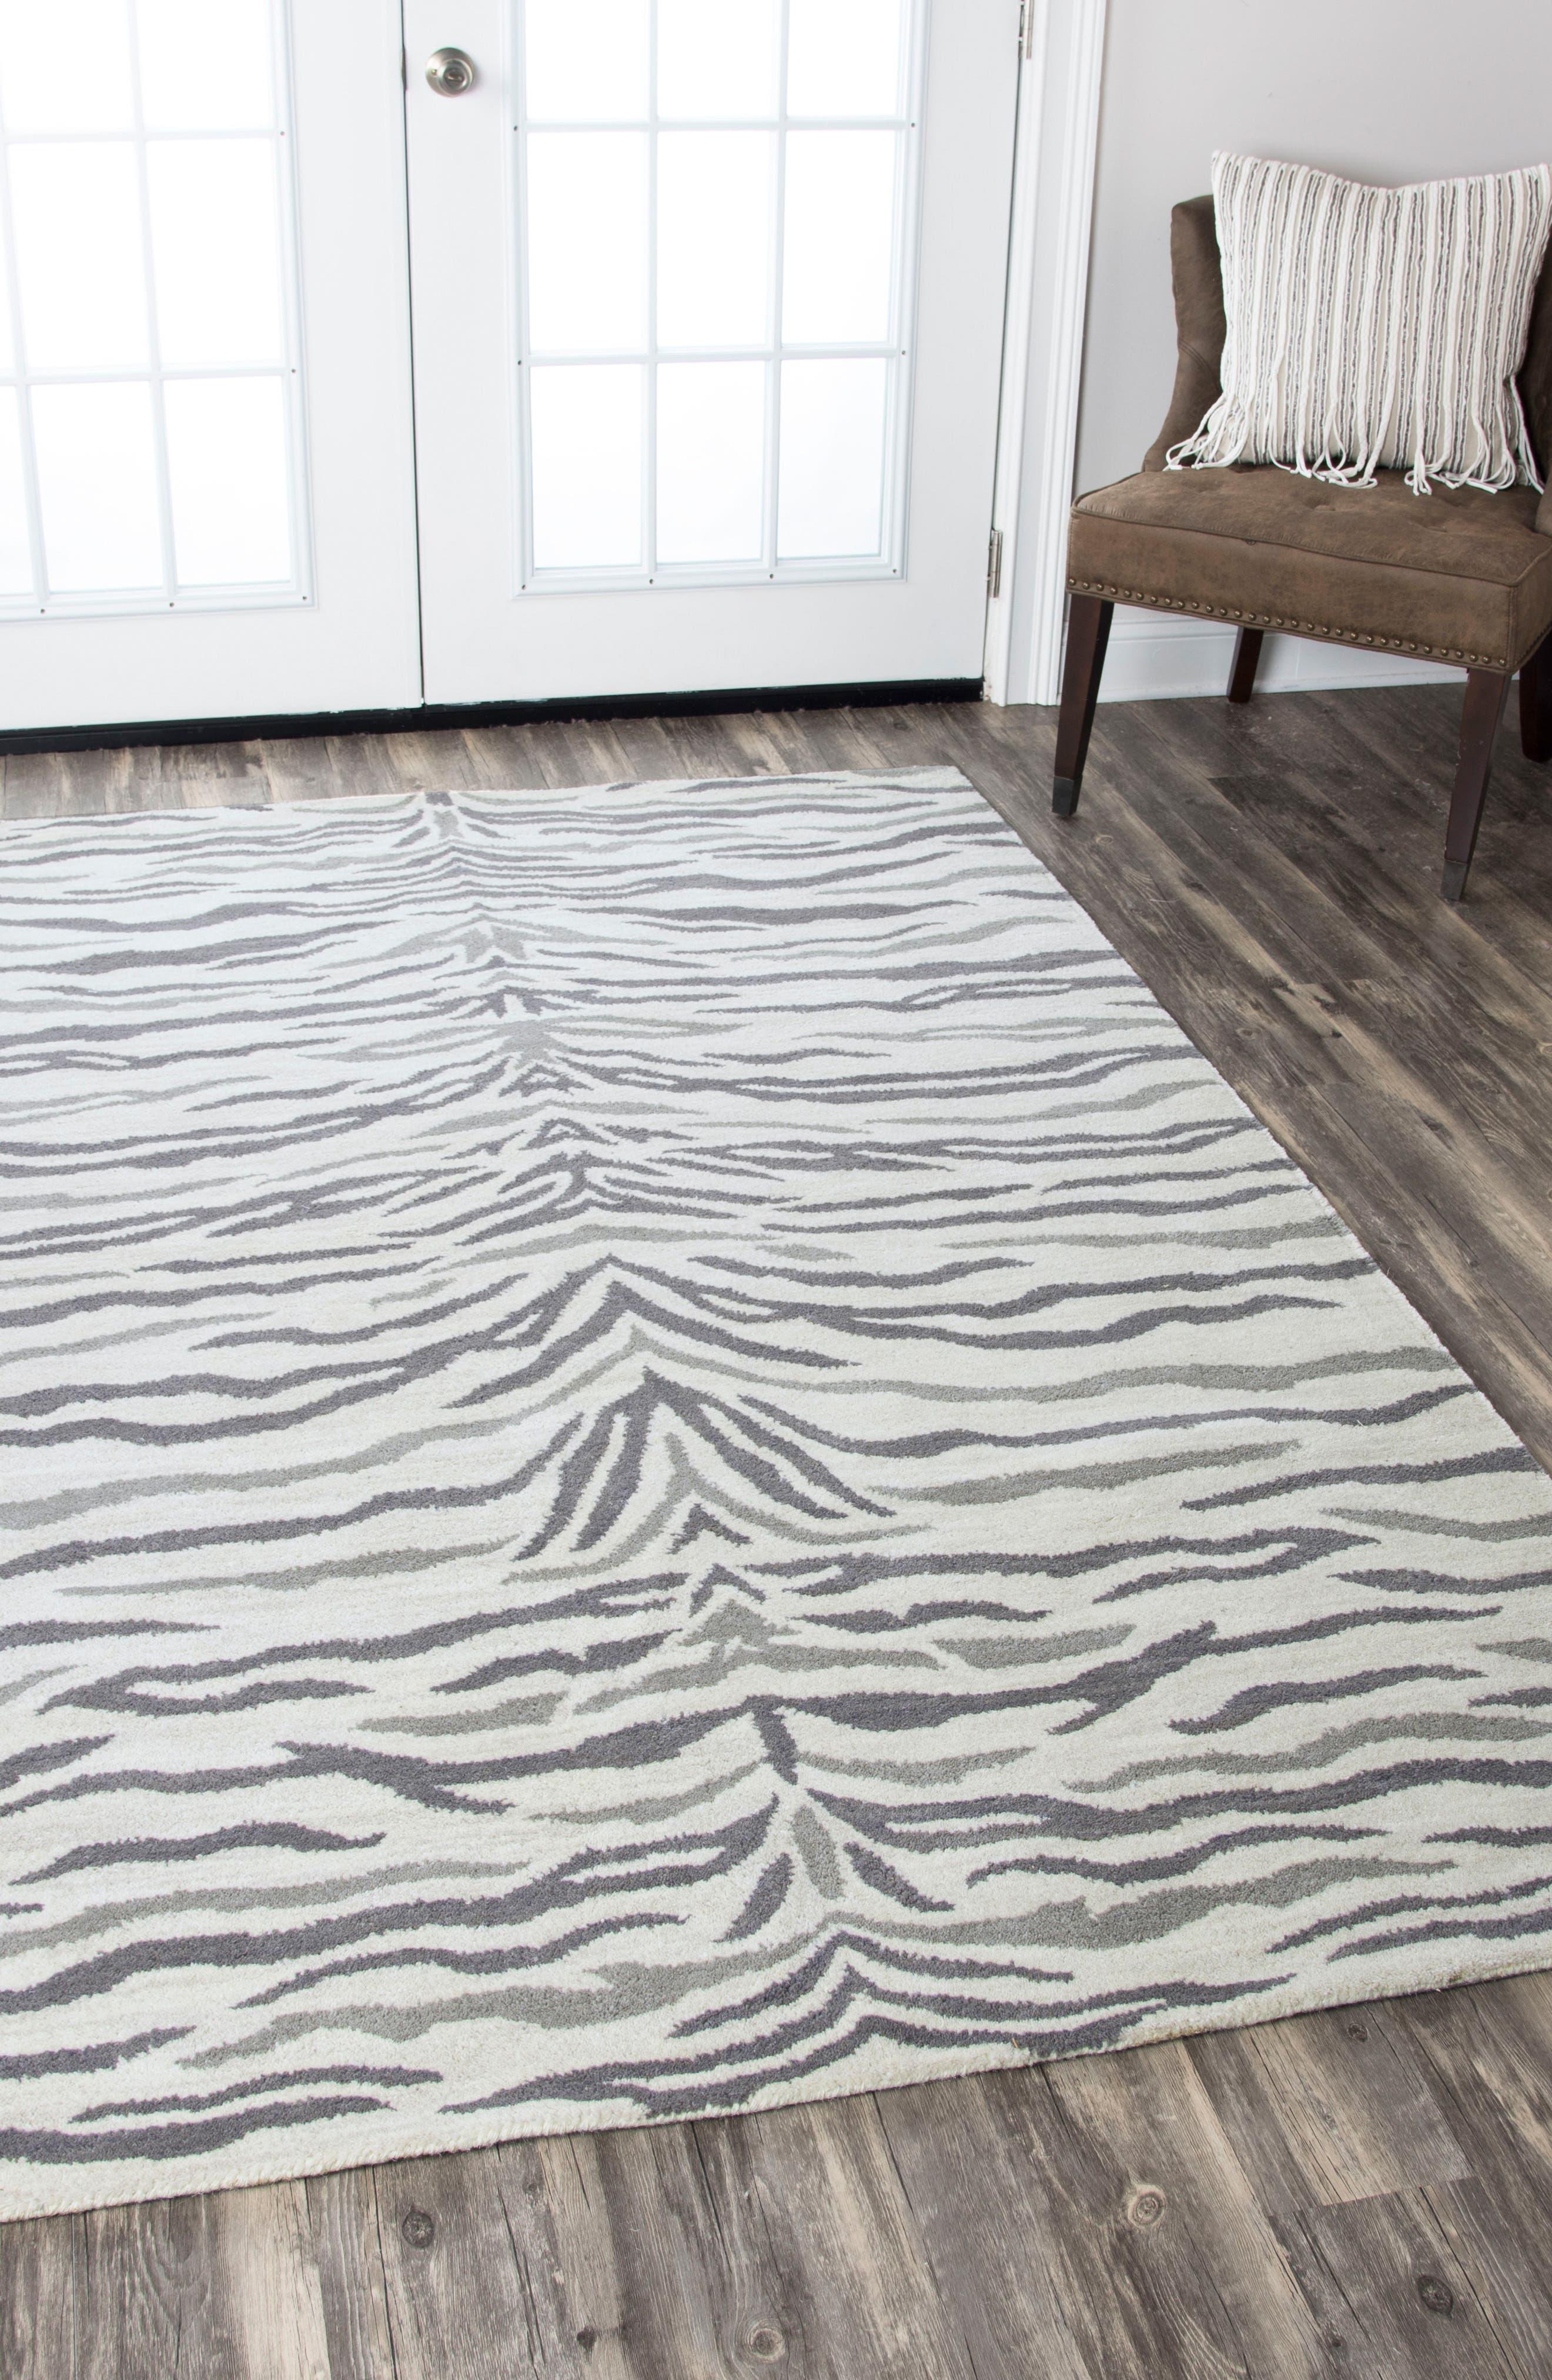 'Valintino Zebra' Hand Tufted Wool Area Rug,                             Alternate thumbnail 2, color,                             020